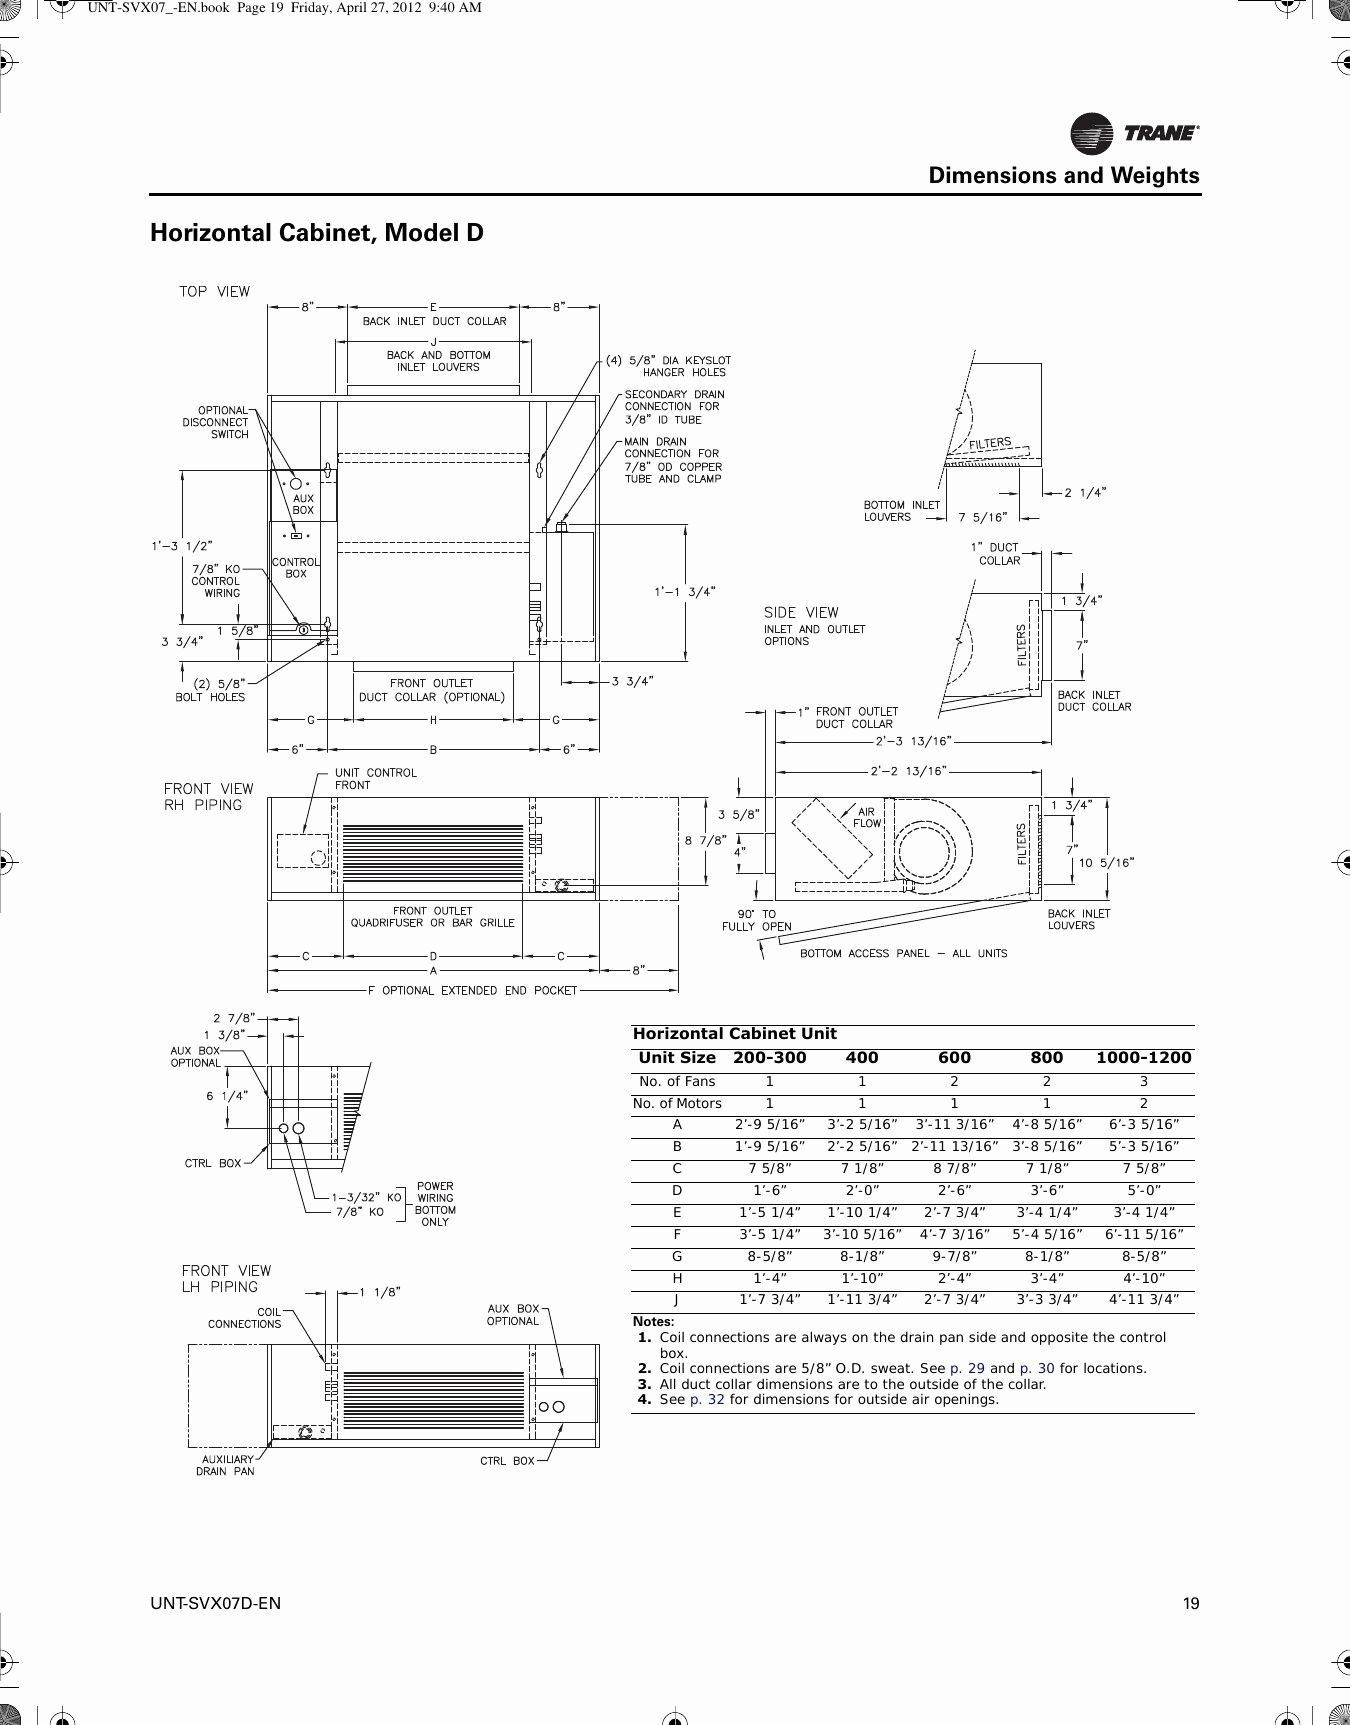 unique wiring diagram for underfloor heating thermostat diagrams digramssample diagramimages wiringdiagramsample wiringdiagram [ 1350 x 1725 Pixel ]